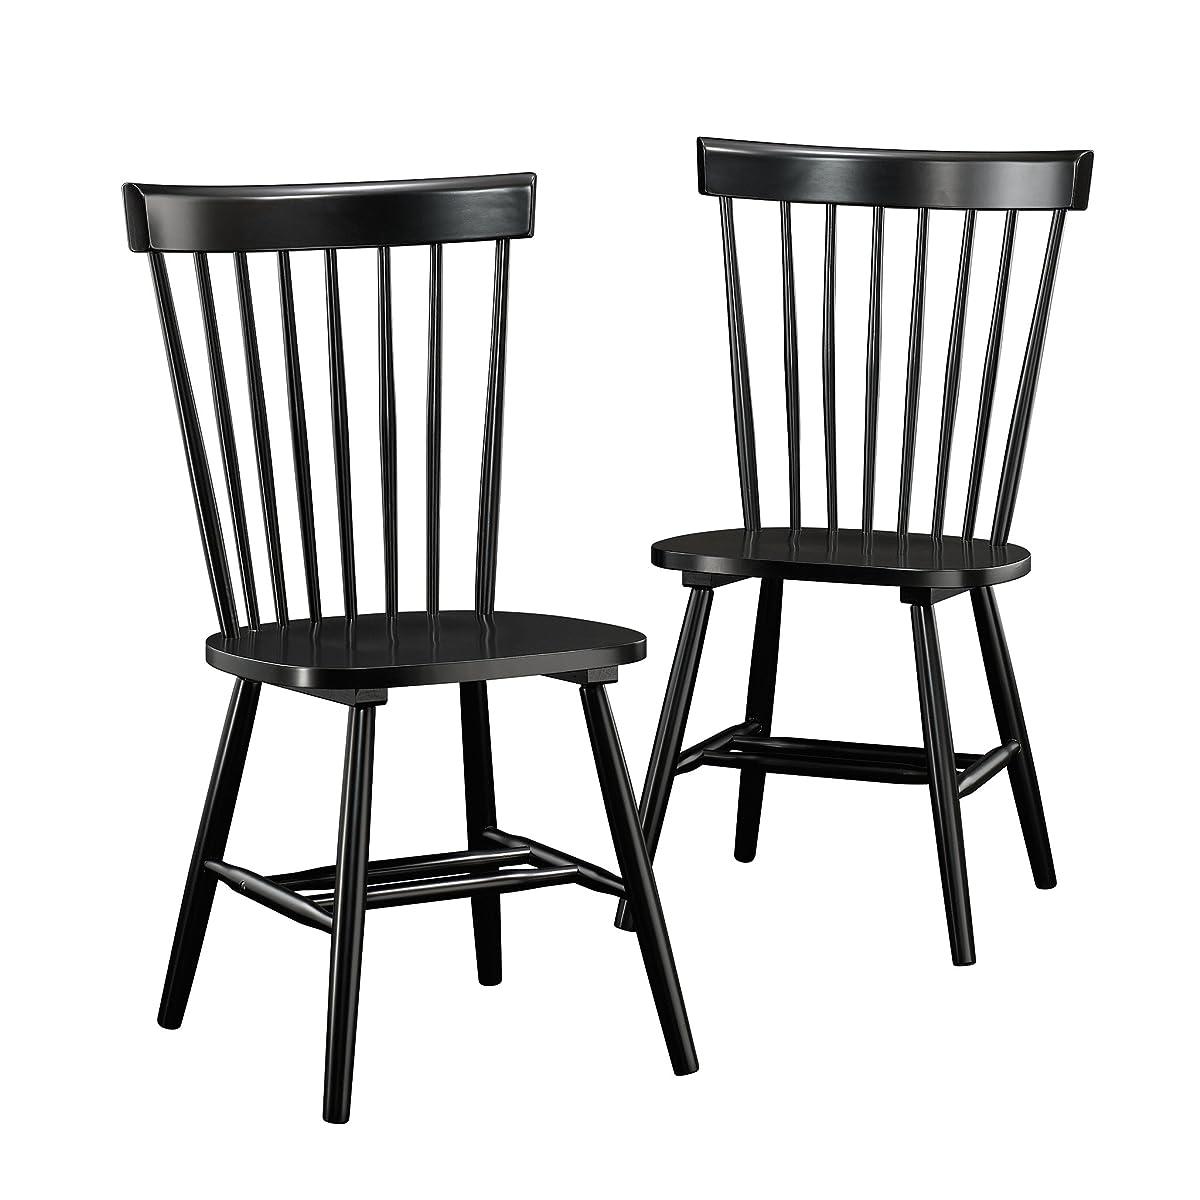 Sauder 418892 Spindle Back Chairs, Black